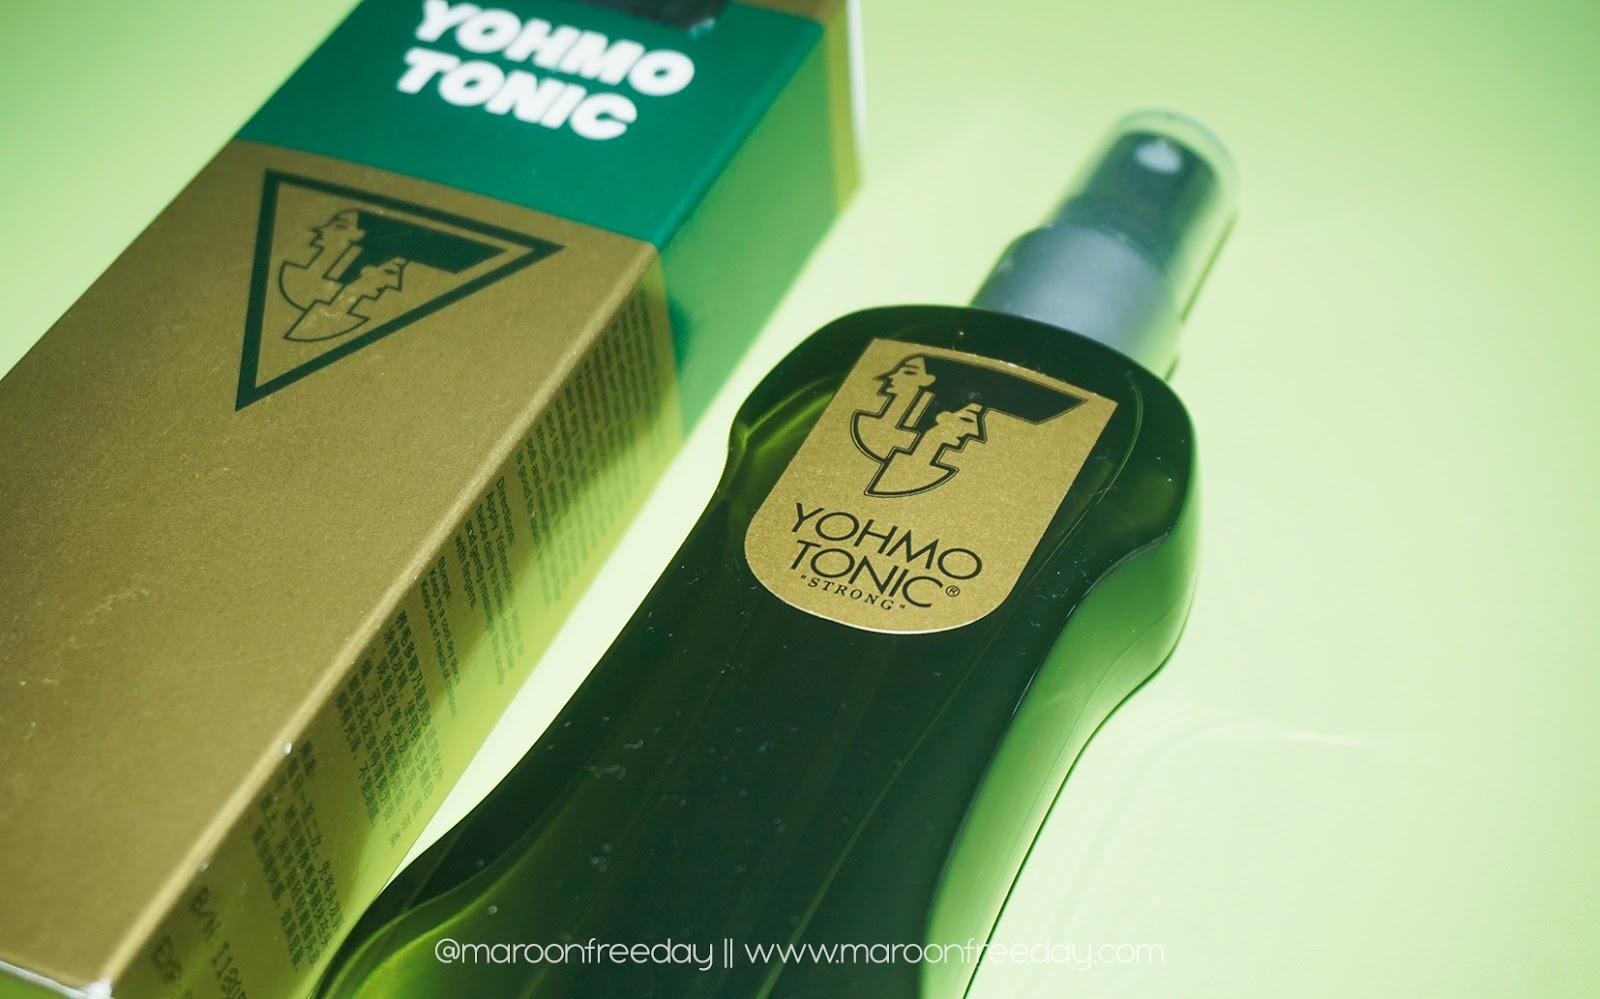 Review Yohmotonic Hair Tonic Untuk Rambut Rontok